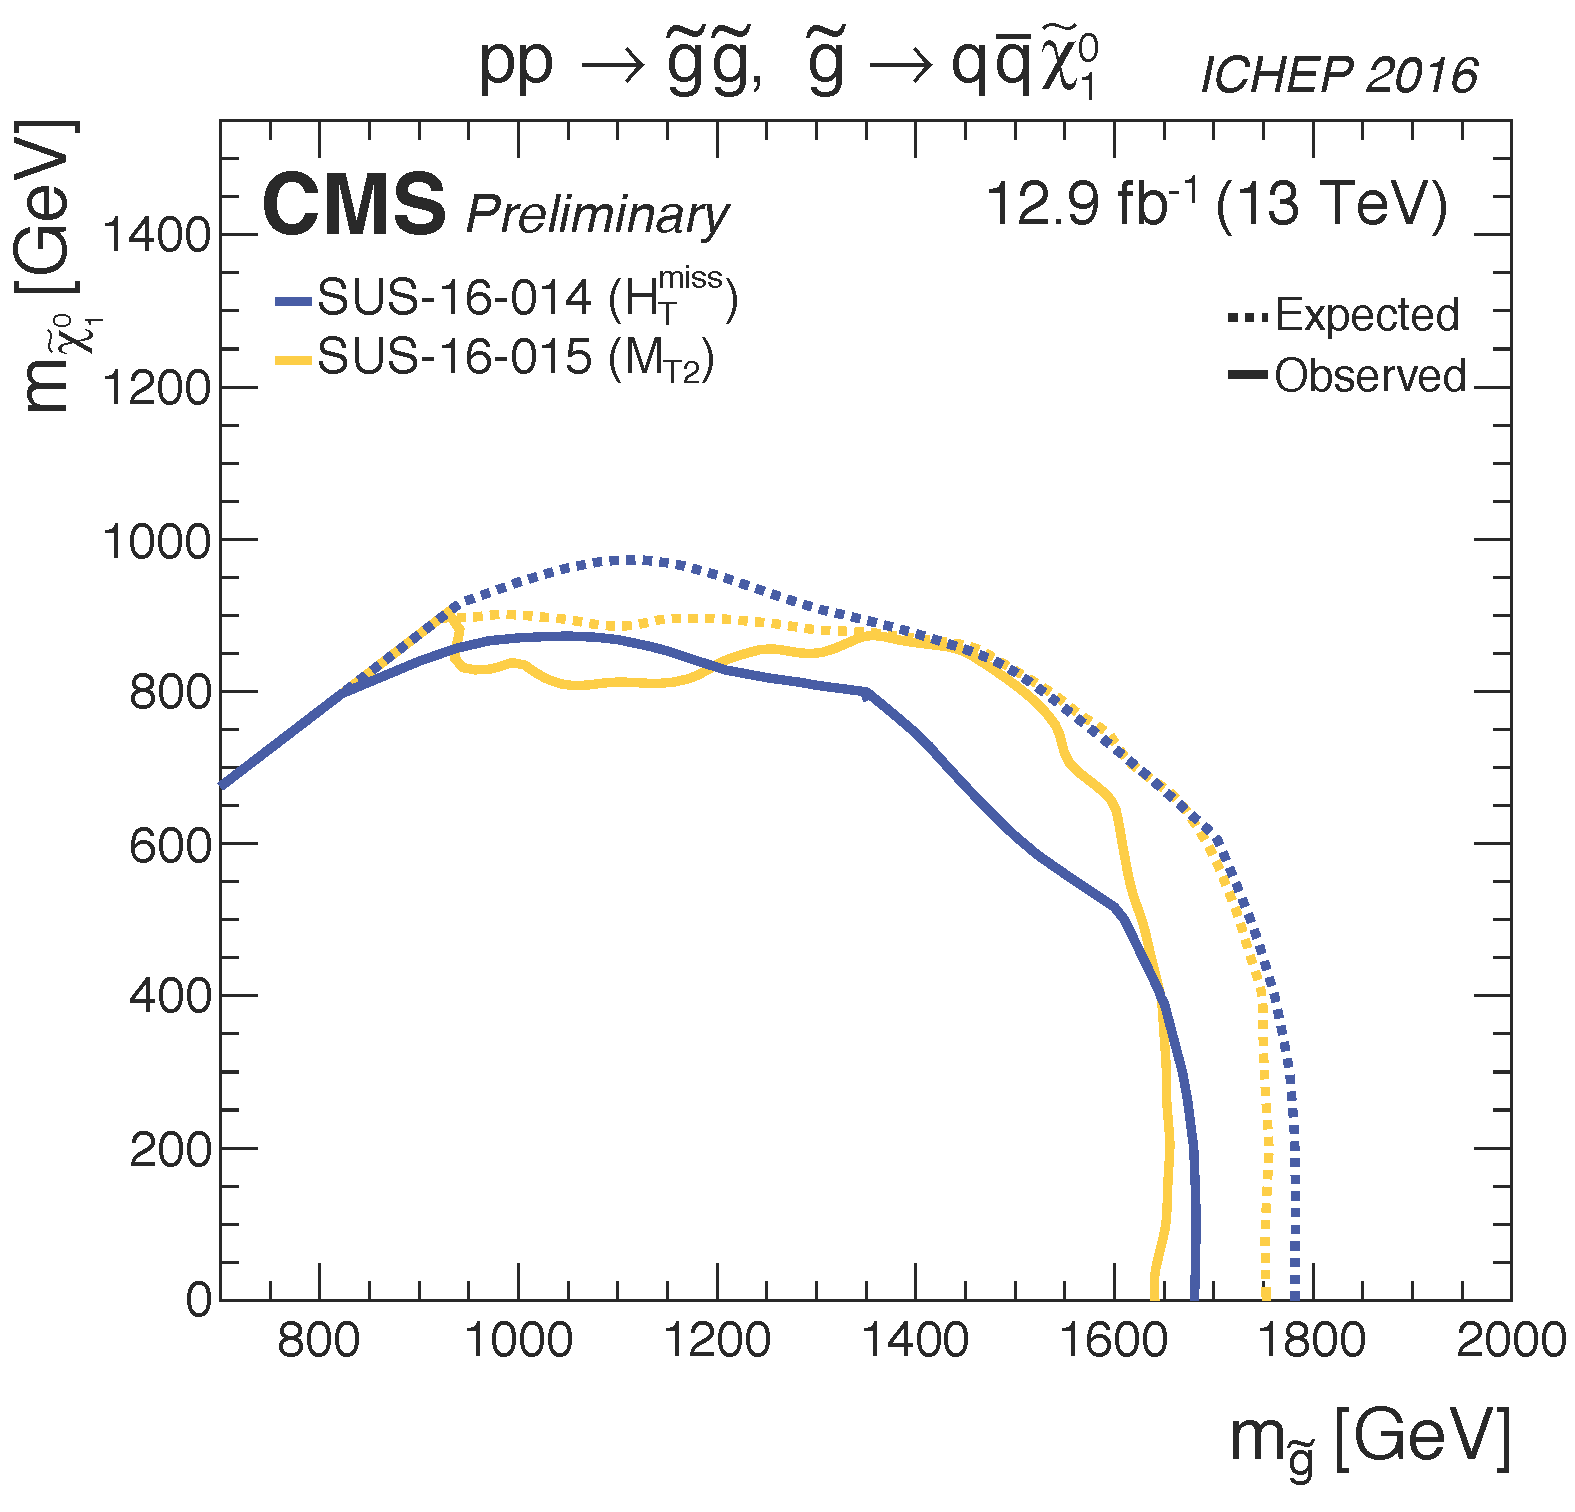 T1qqqq_limits_summary_cms_ICHEP16.png